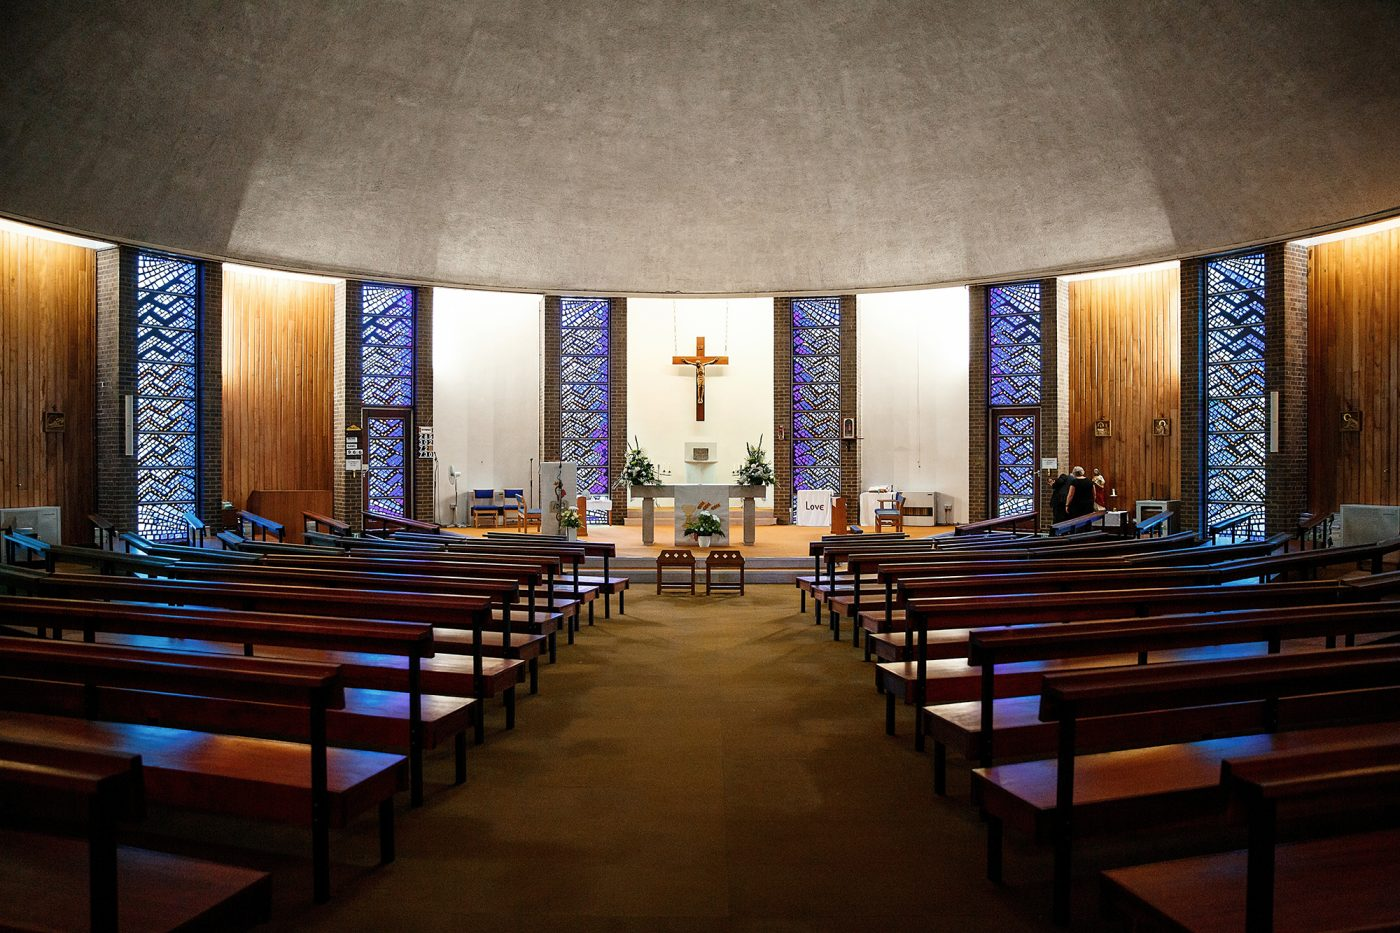 st mary's church in hatfioeld